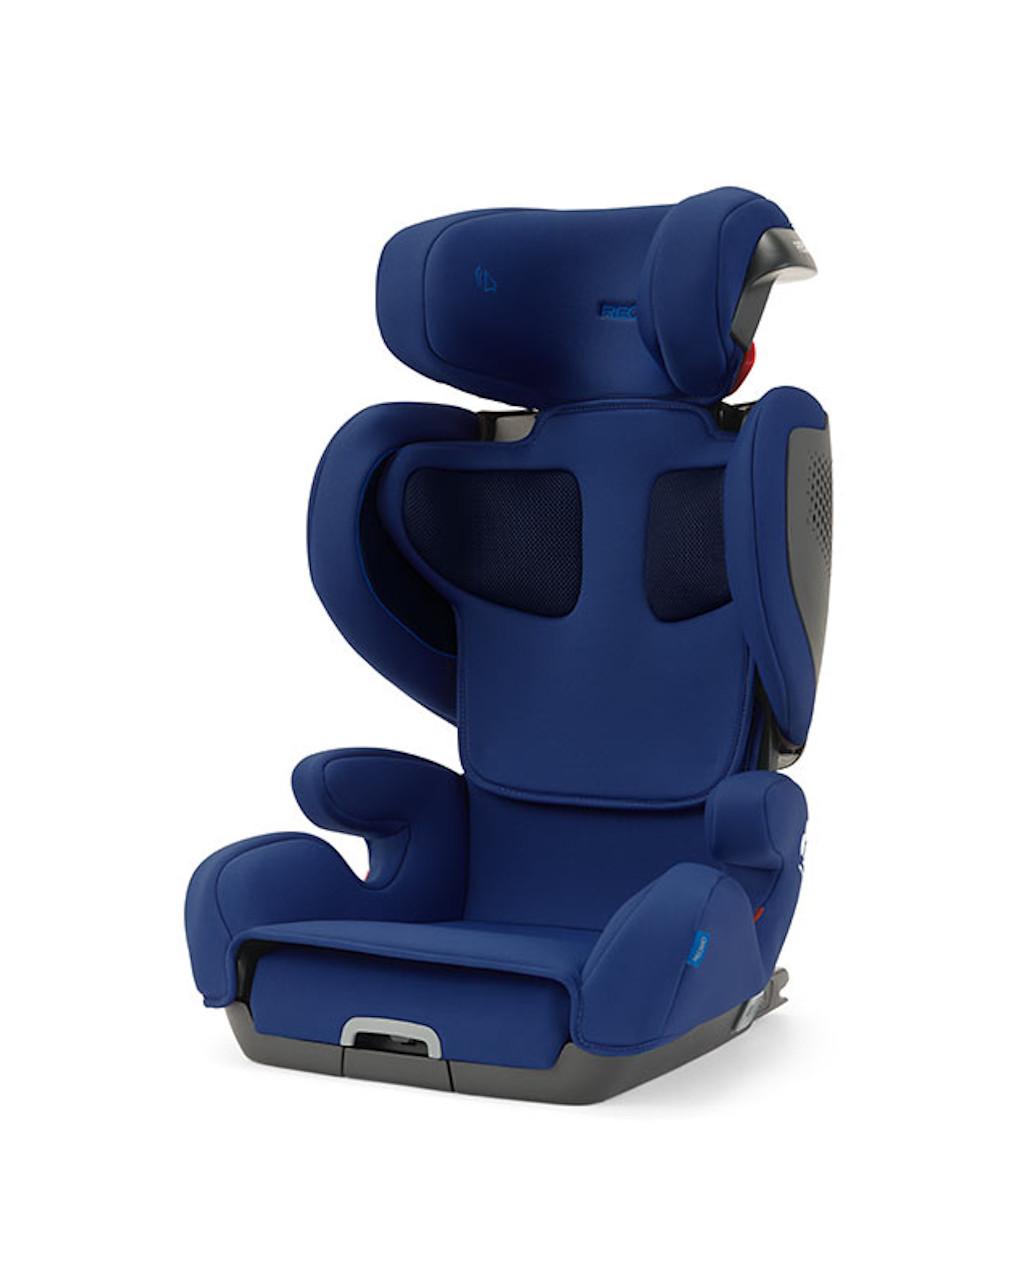 Recaro seggiolino auto mako elite – select pacific blue - Recaro